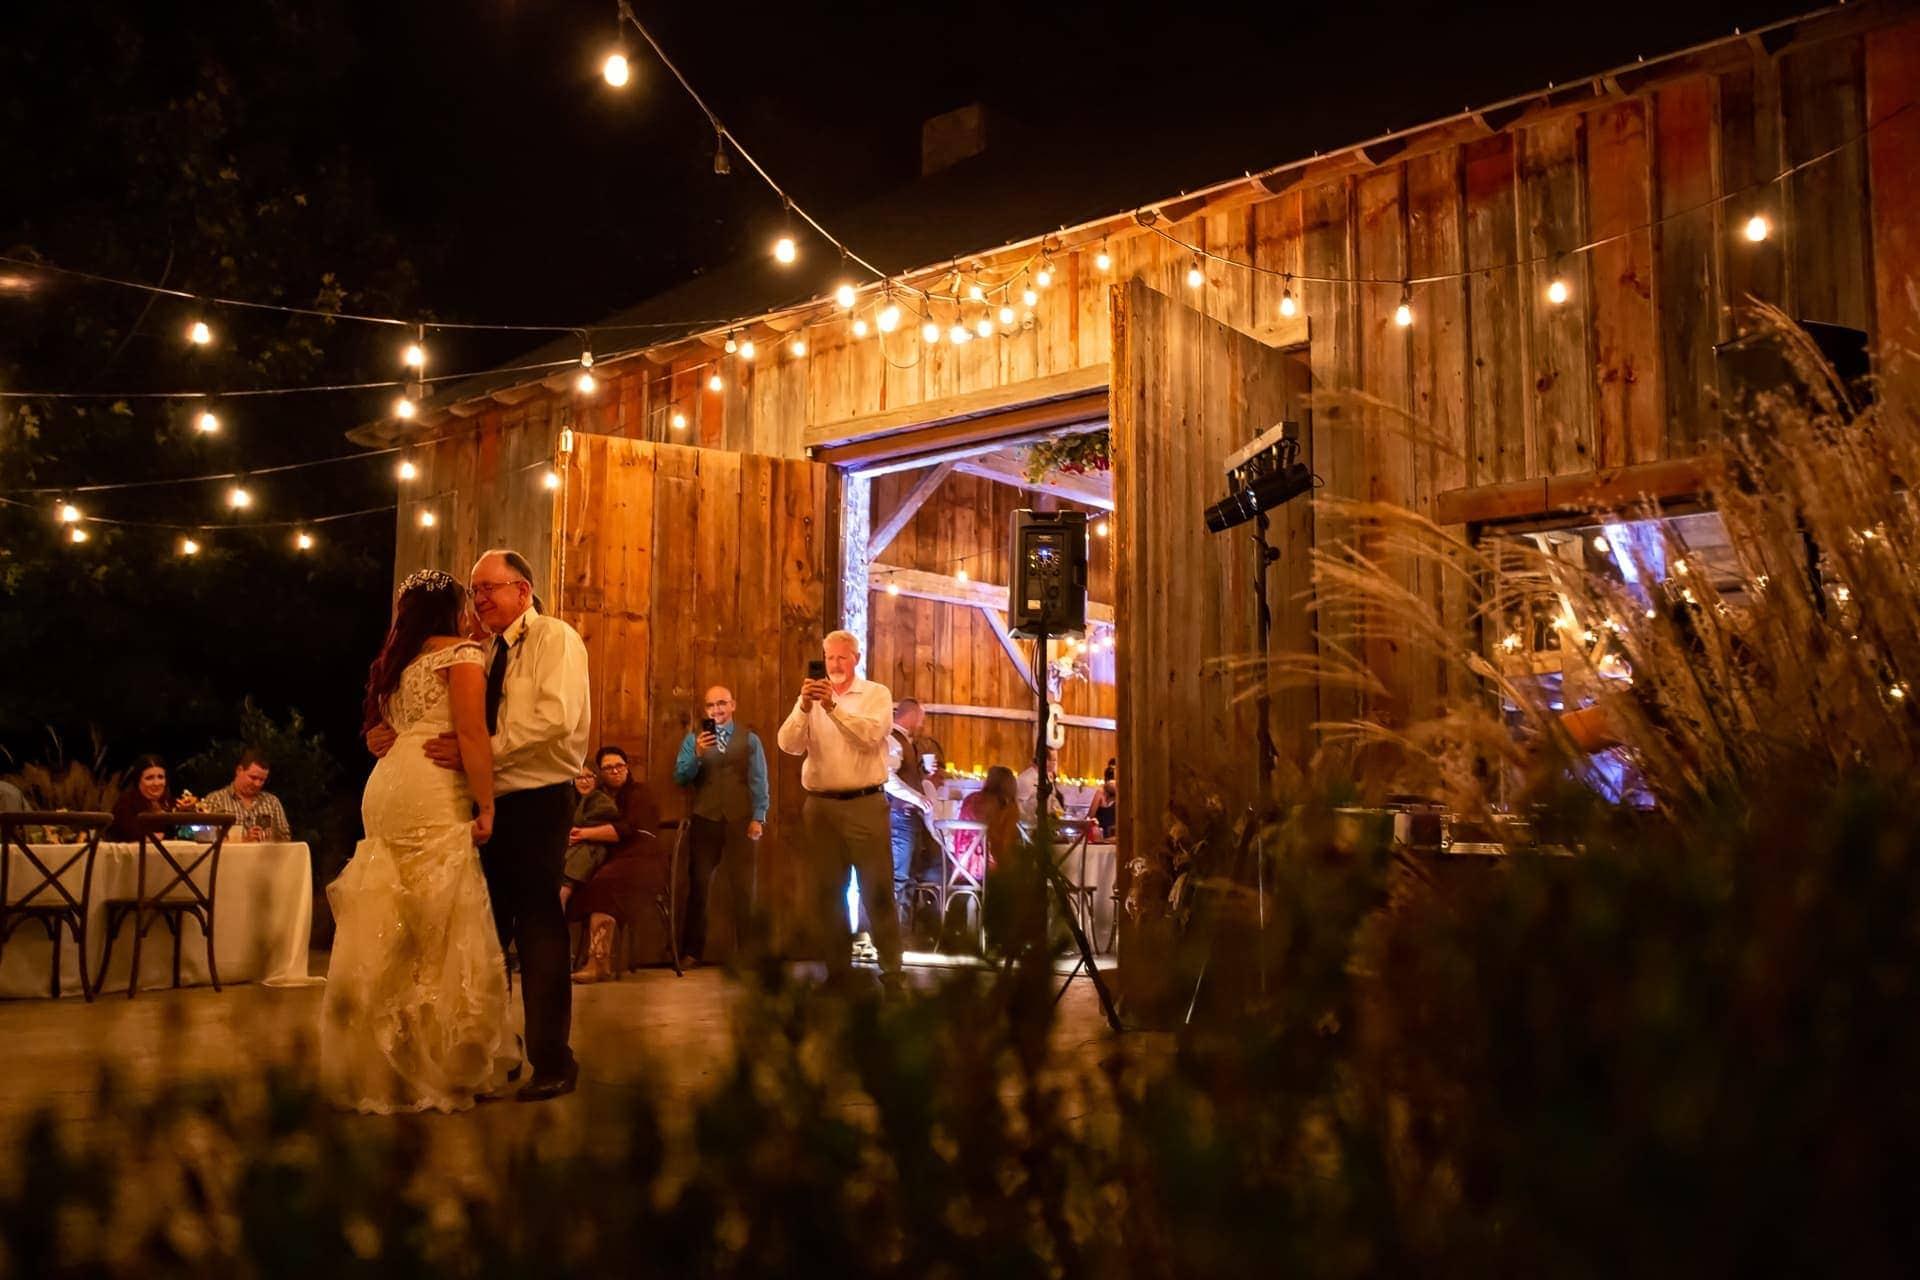 Dancing under the starts at Esperanza Ranch